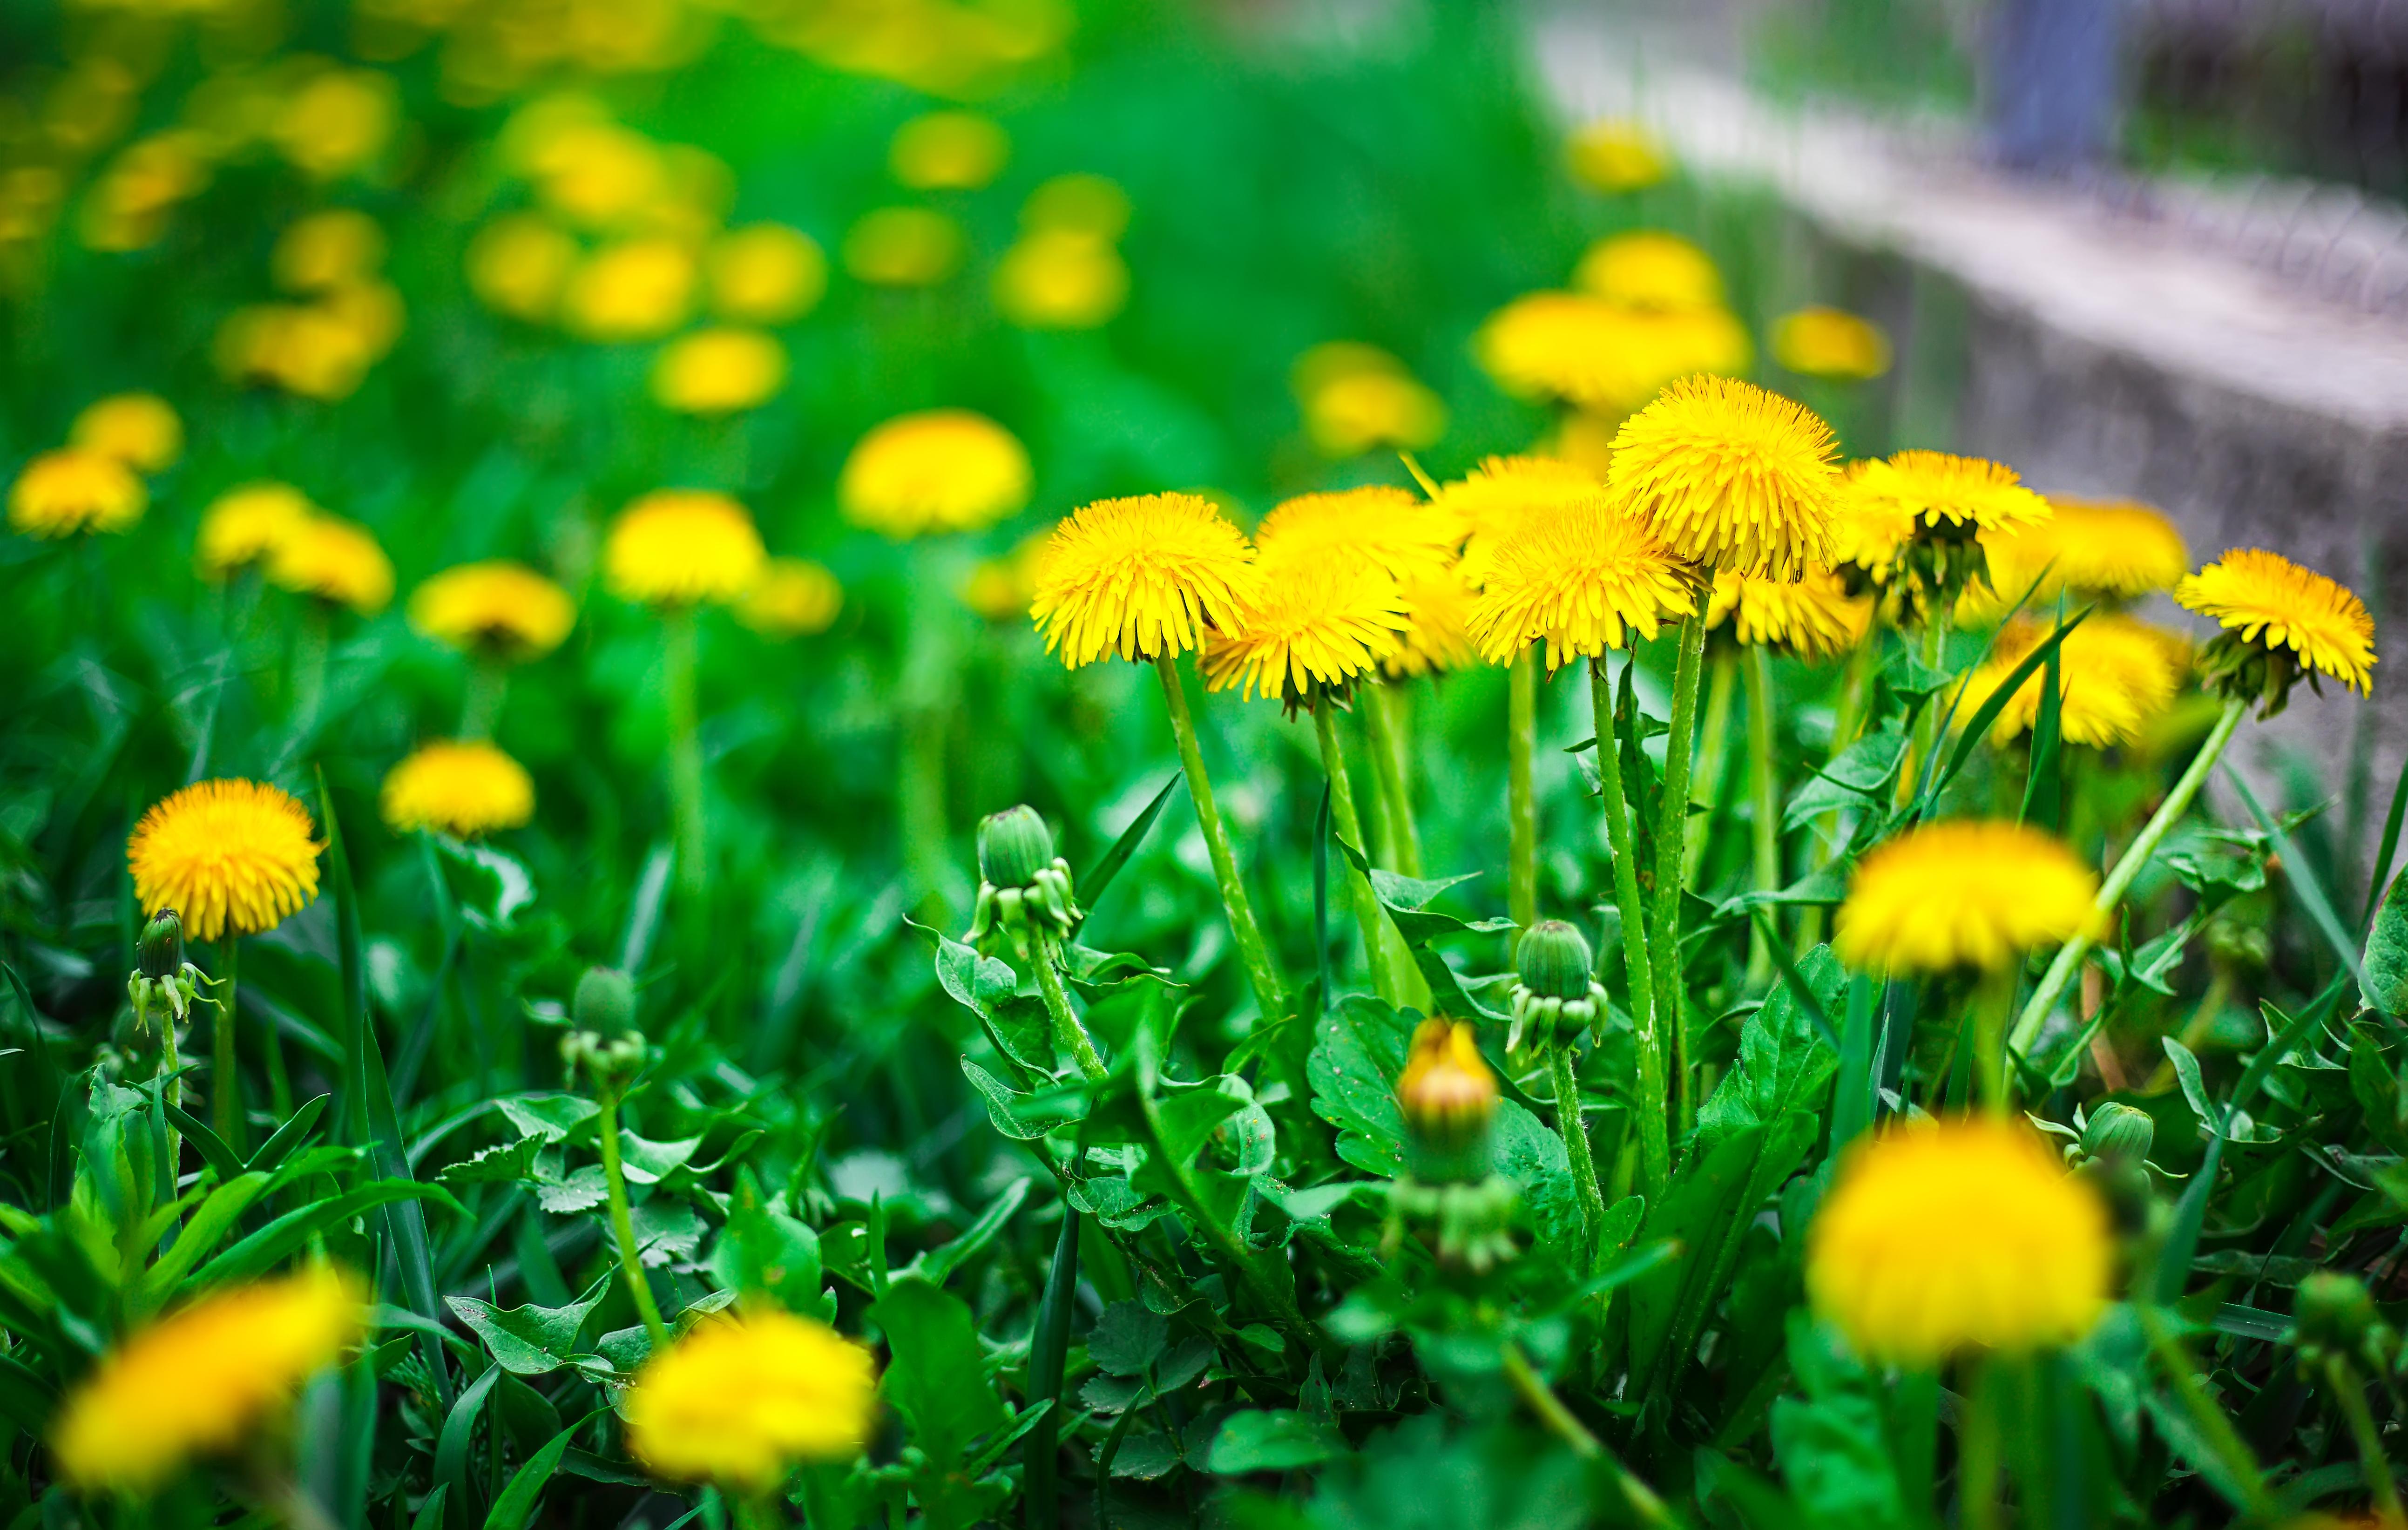 Will Vinegar Kill Trees & Grass? | Home Guides | SF Gate